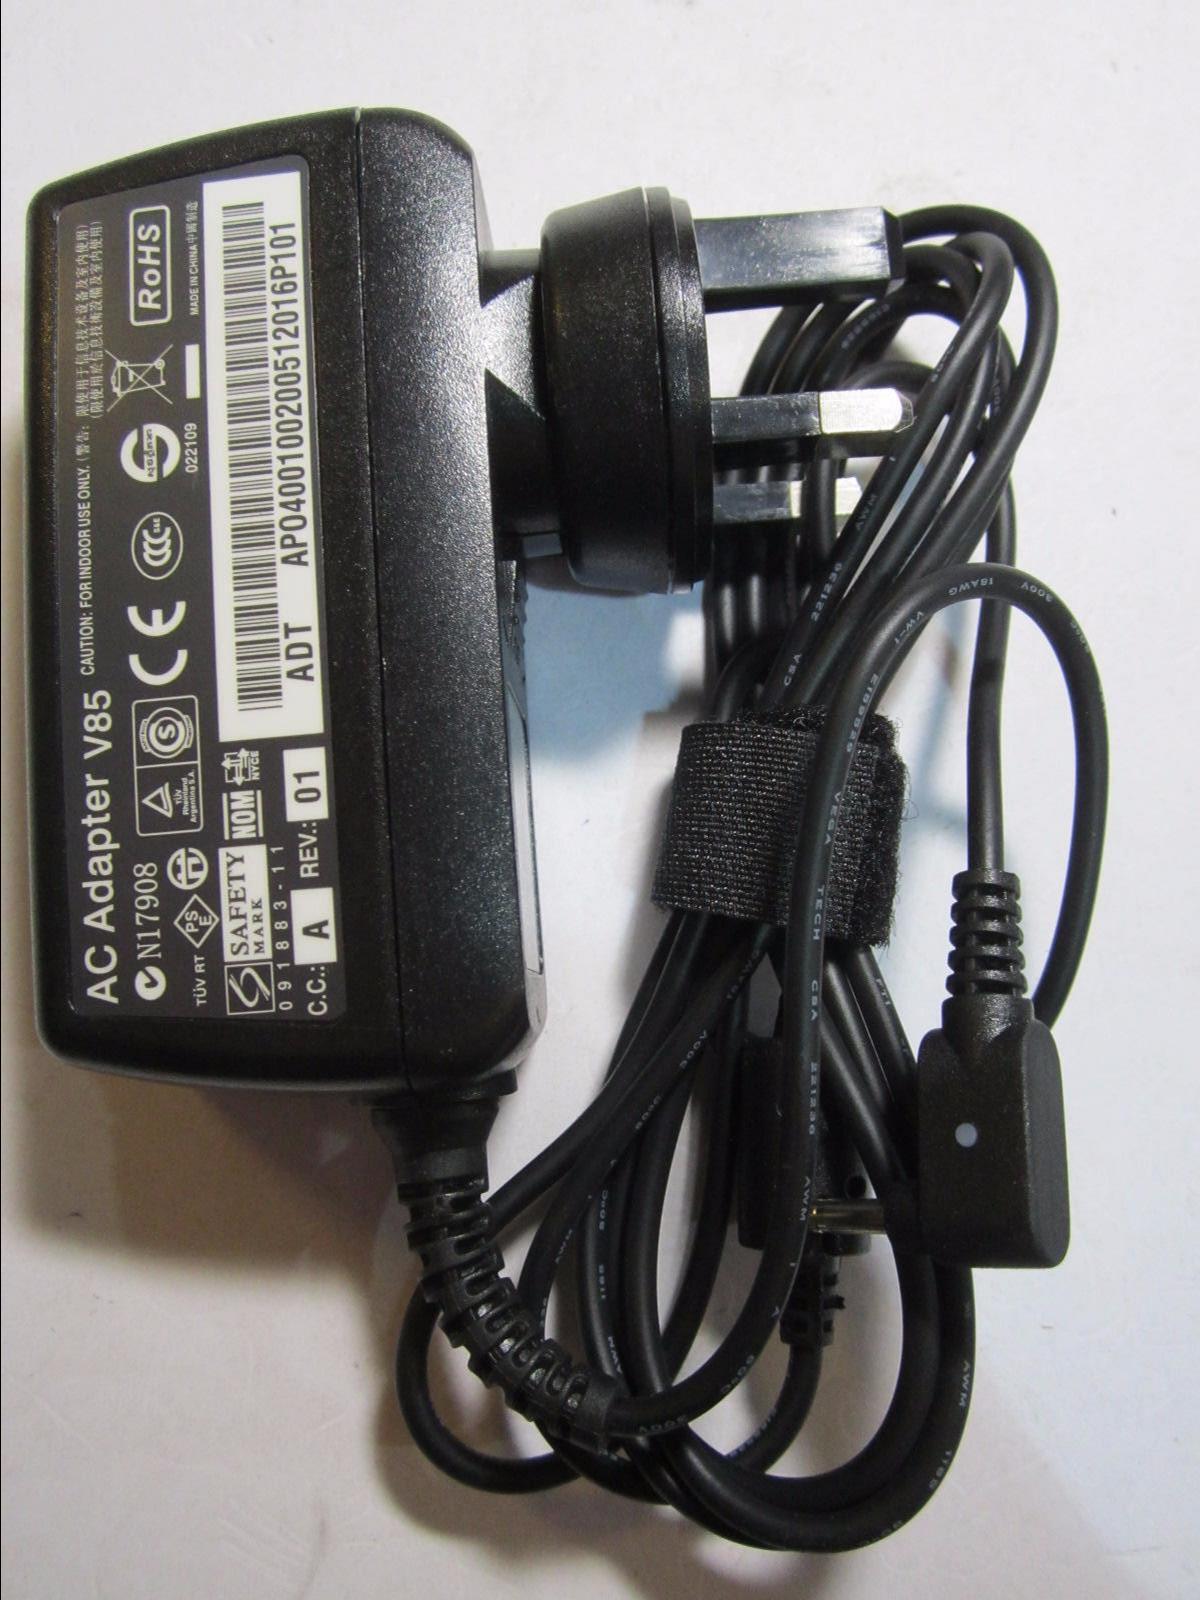 5V 1.75A 1750mA AC-DC Switching Adaptor Power Supply 3.0x1.1 3.0mmx1.1mm